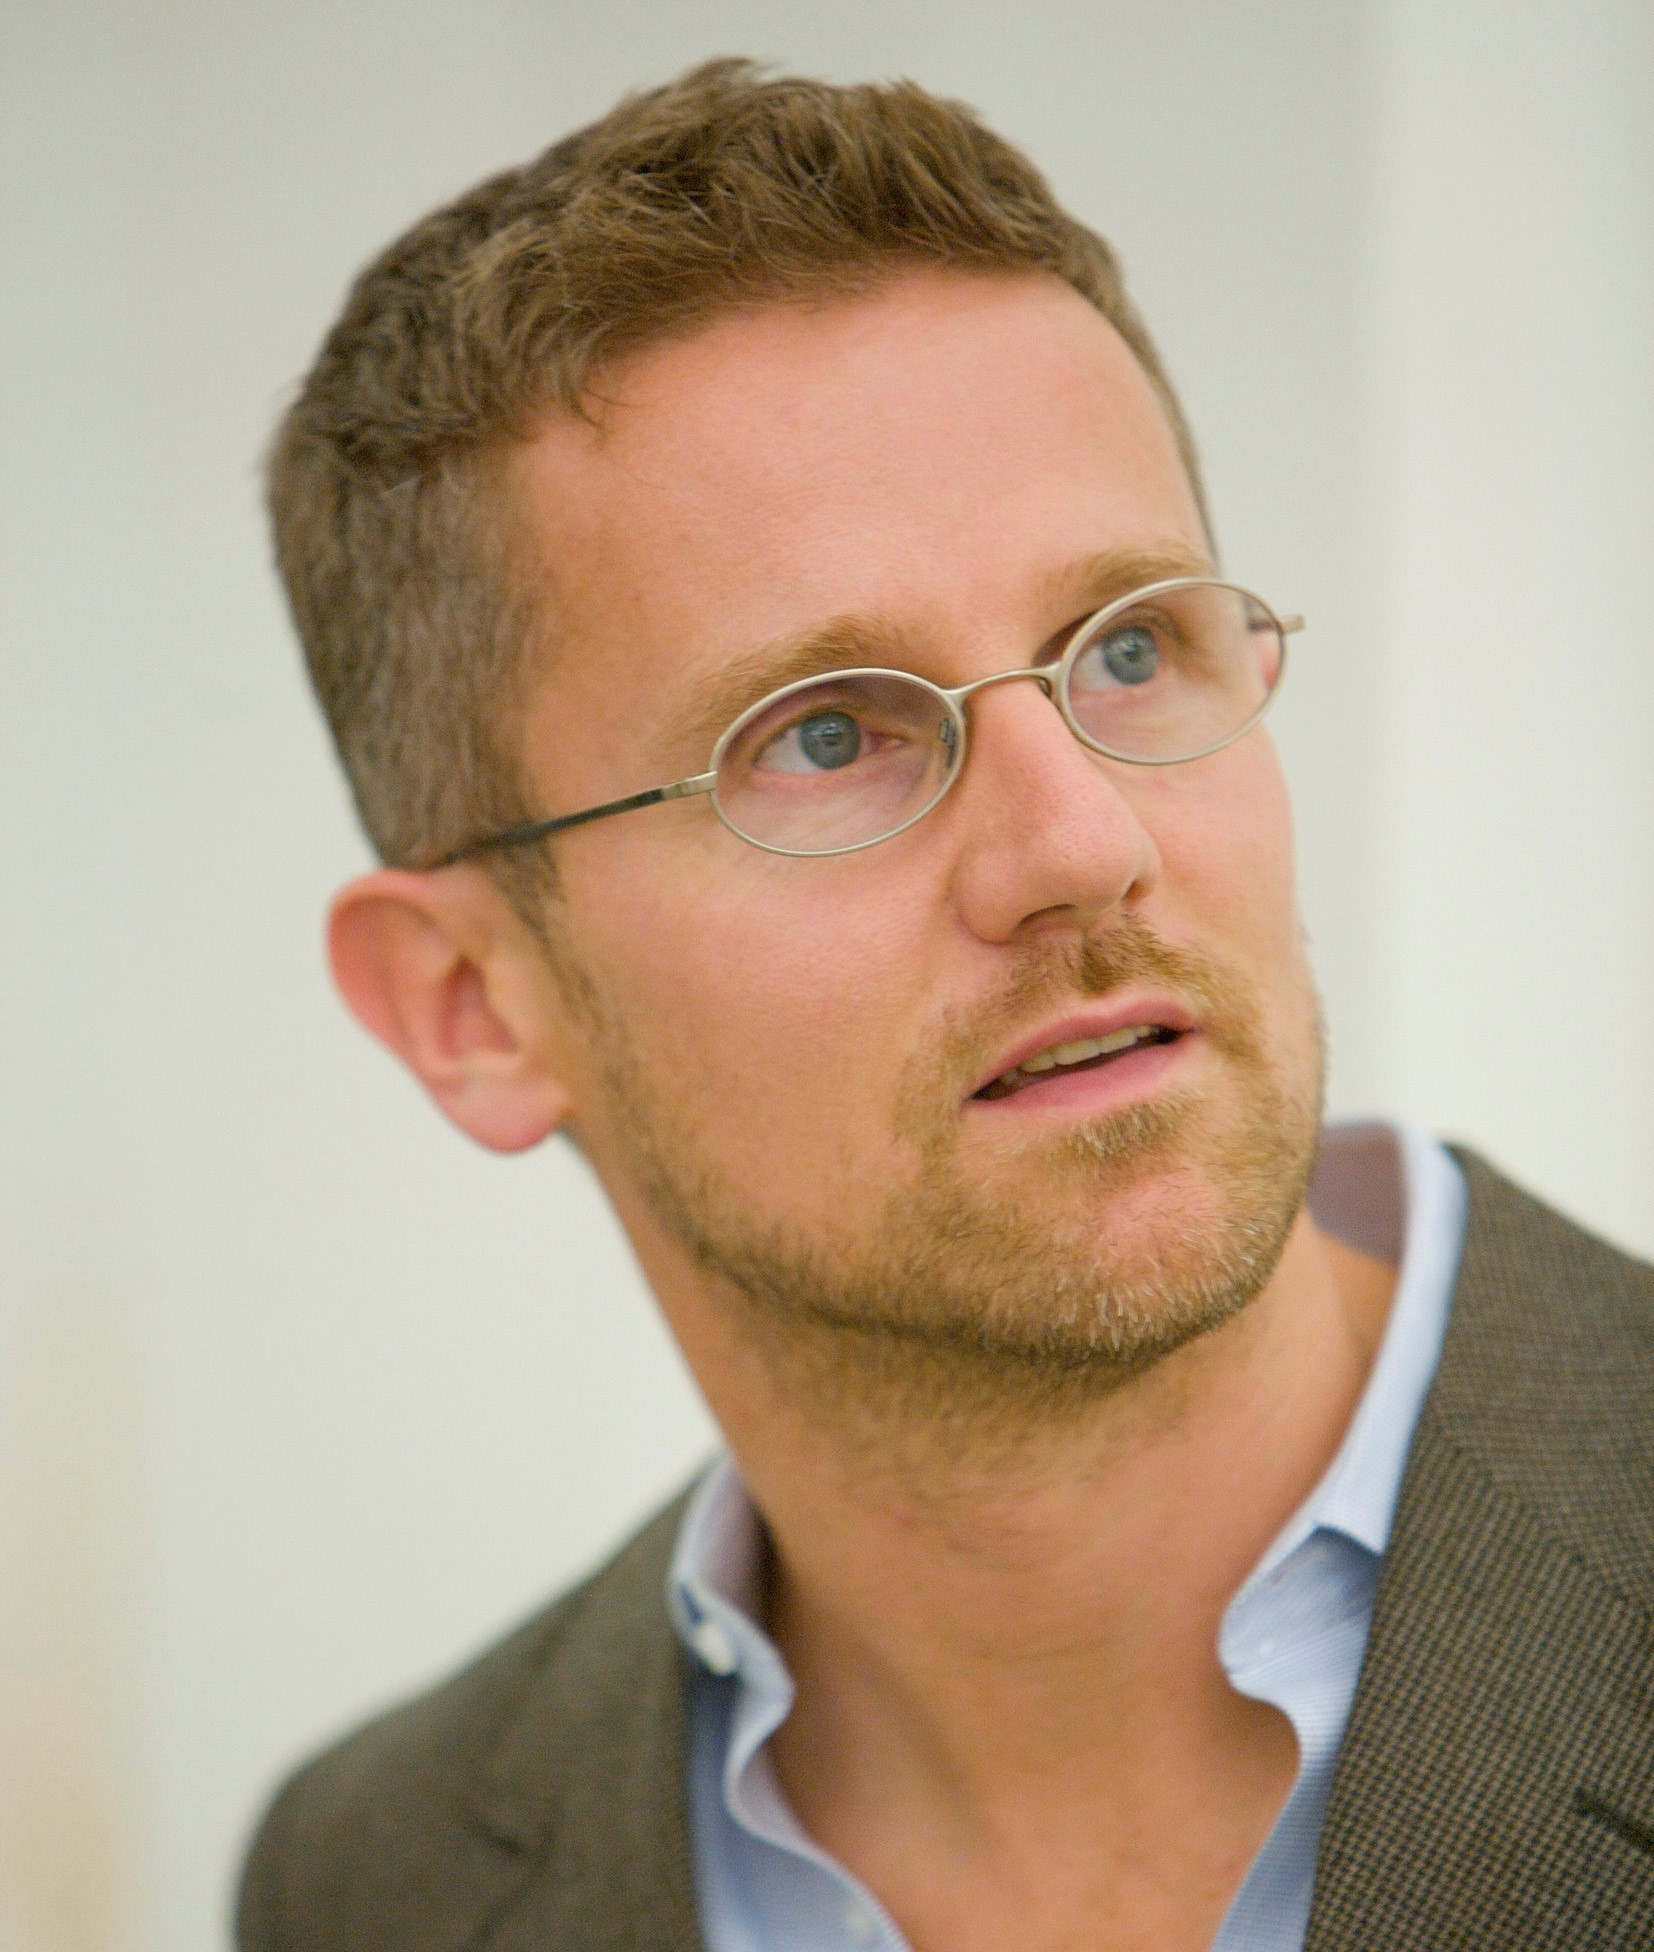 Carlo Ratti speaker - Photo by Lars Krüger